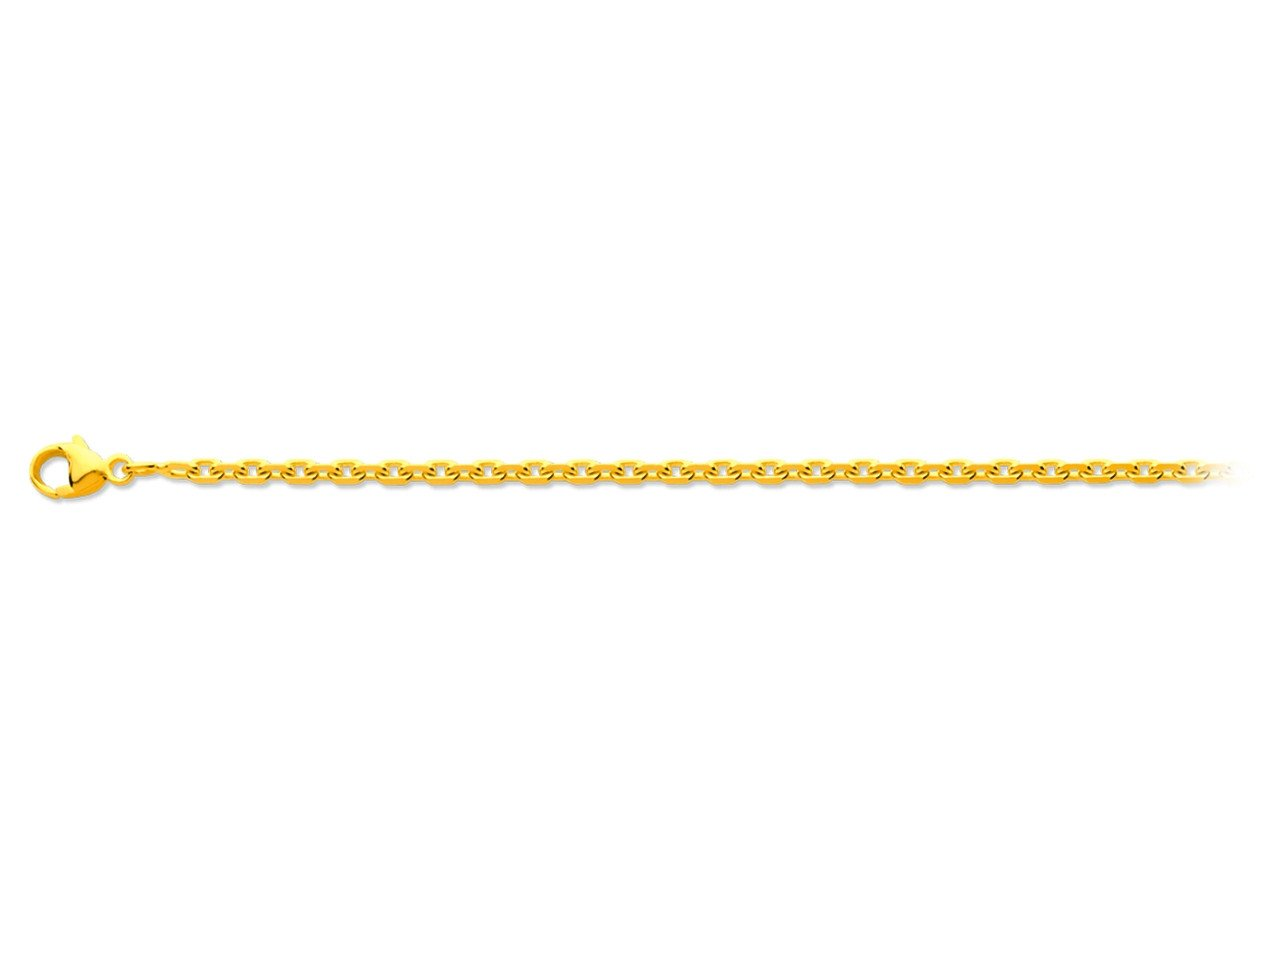 Chaîne maille forçat en or jaune - 40 cm